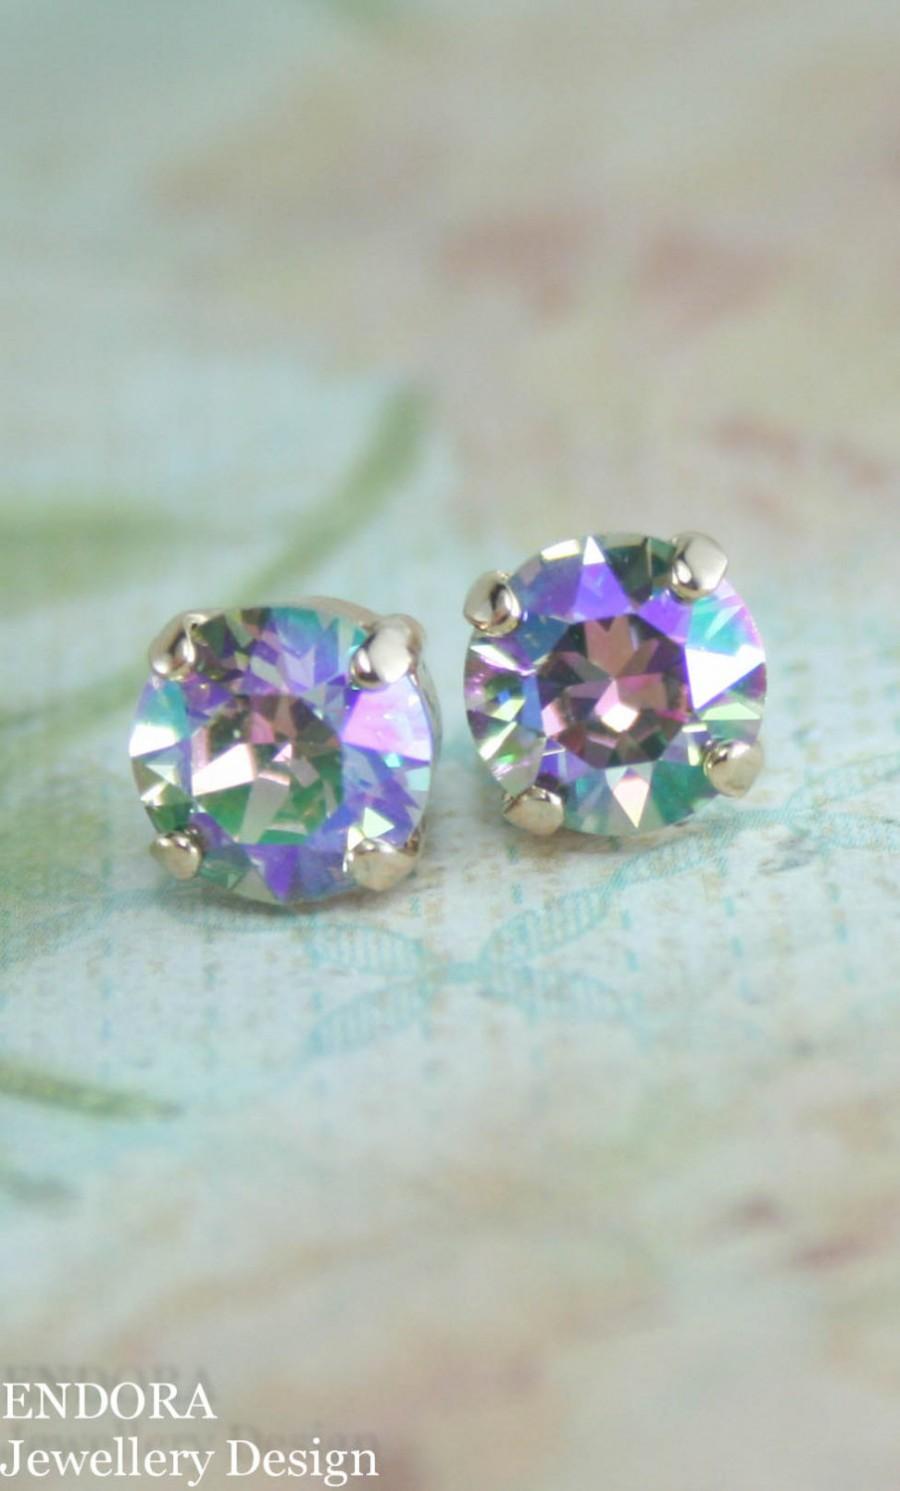 Свадьба - Crystal stud earrings,stud earrings,rose gold crystal stud earrings,Swarovski earrings,Swarovski Paradise shine,peacock wedding,stud earring